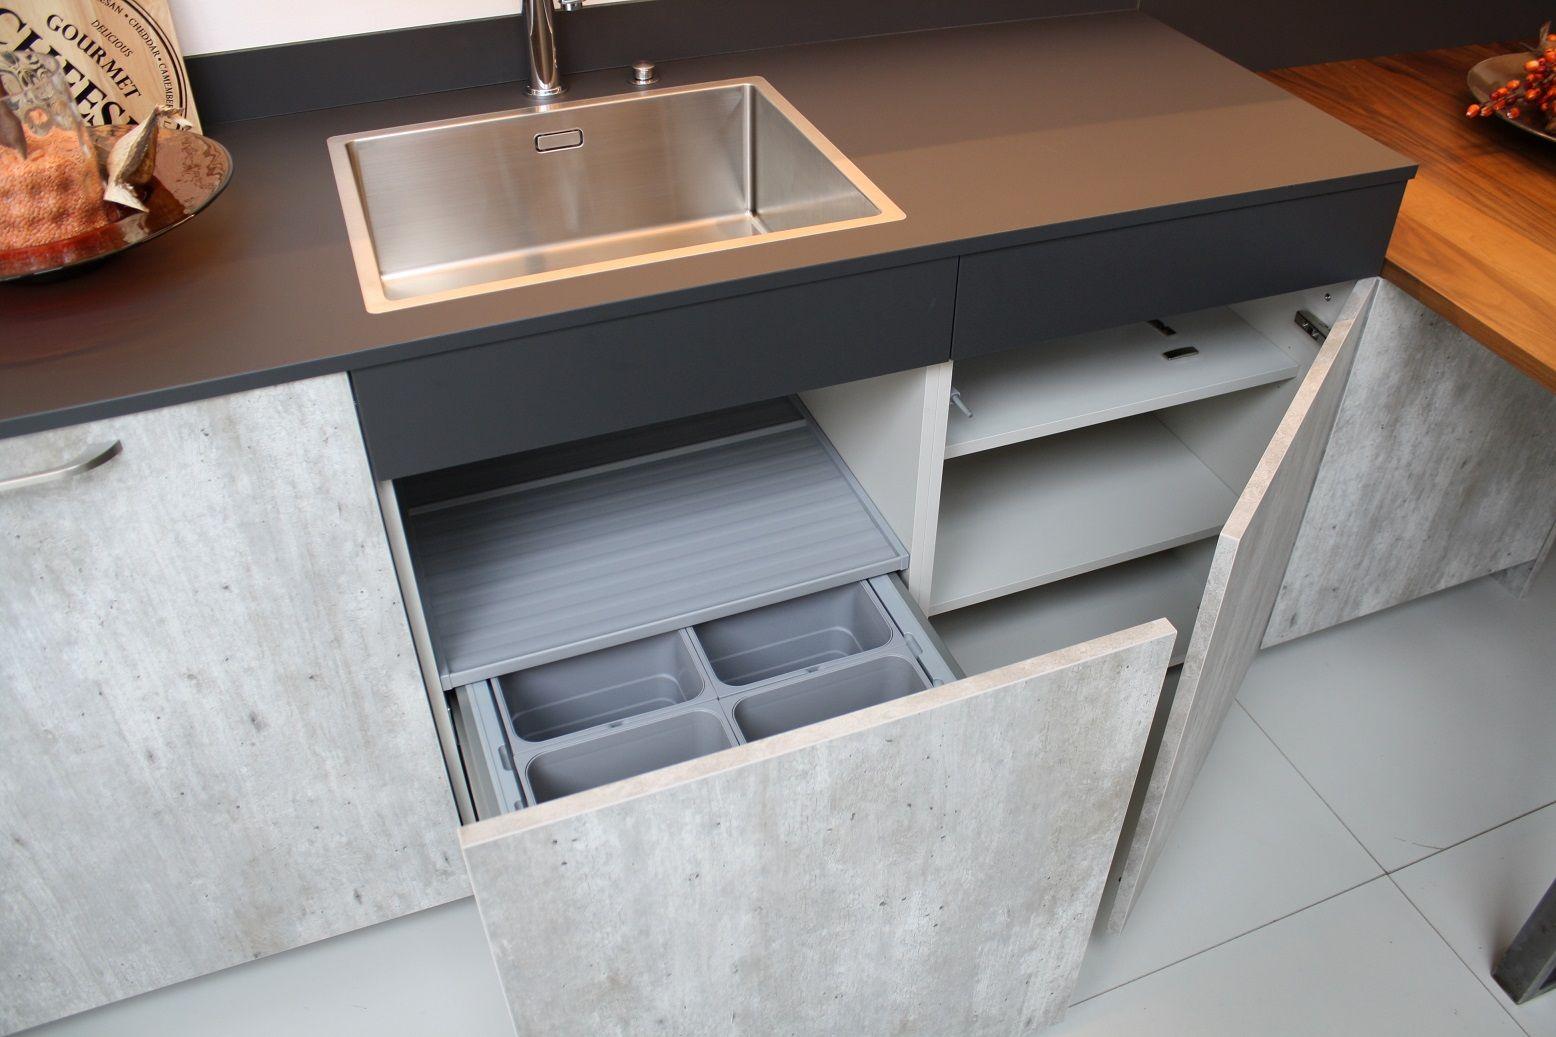 Keuken Kastenwand Te Koop : Afmetingen: Kastenwand: 3040 x 600 mm Hoogte: 2180 mmKookgedeelte